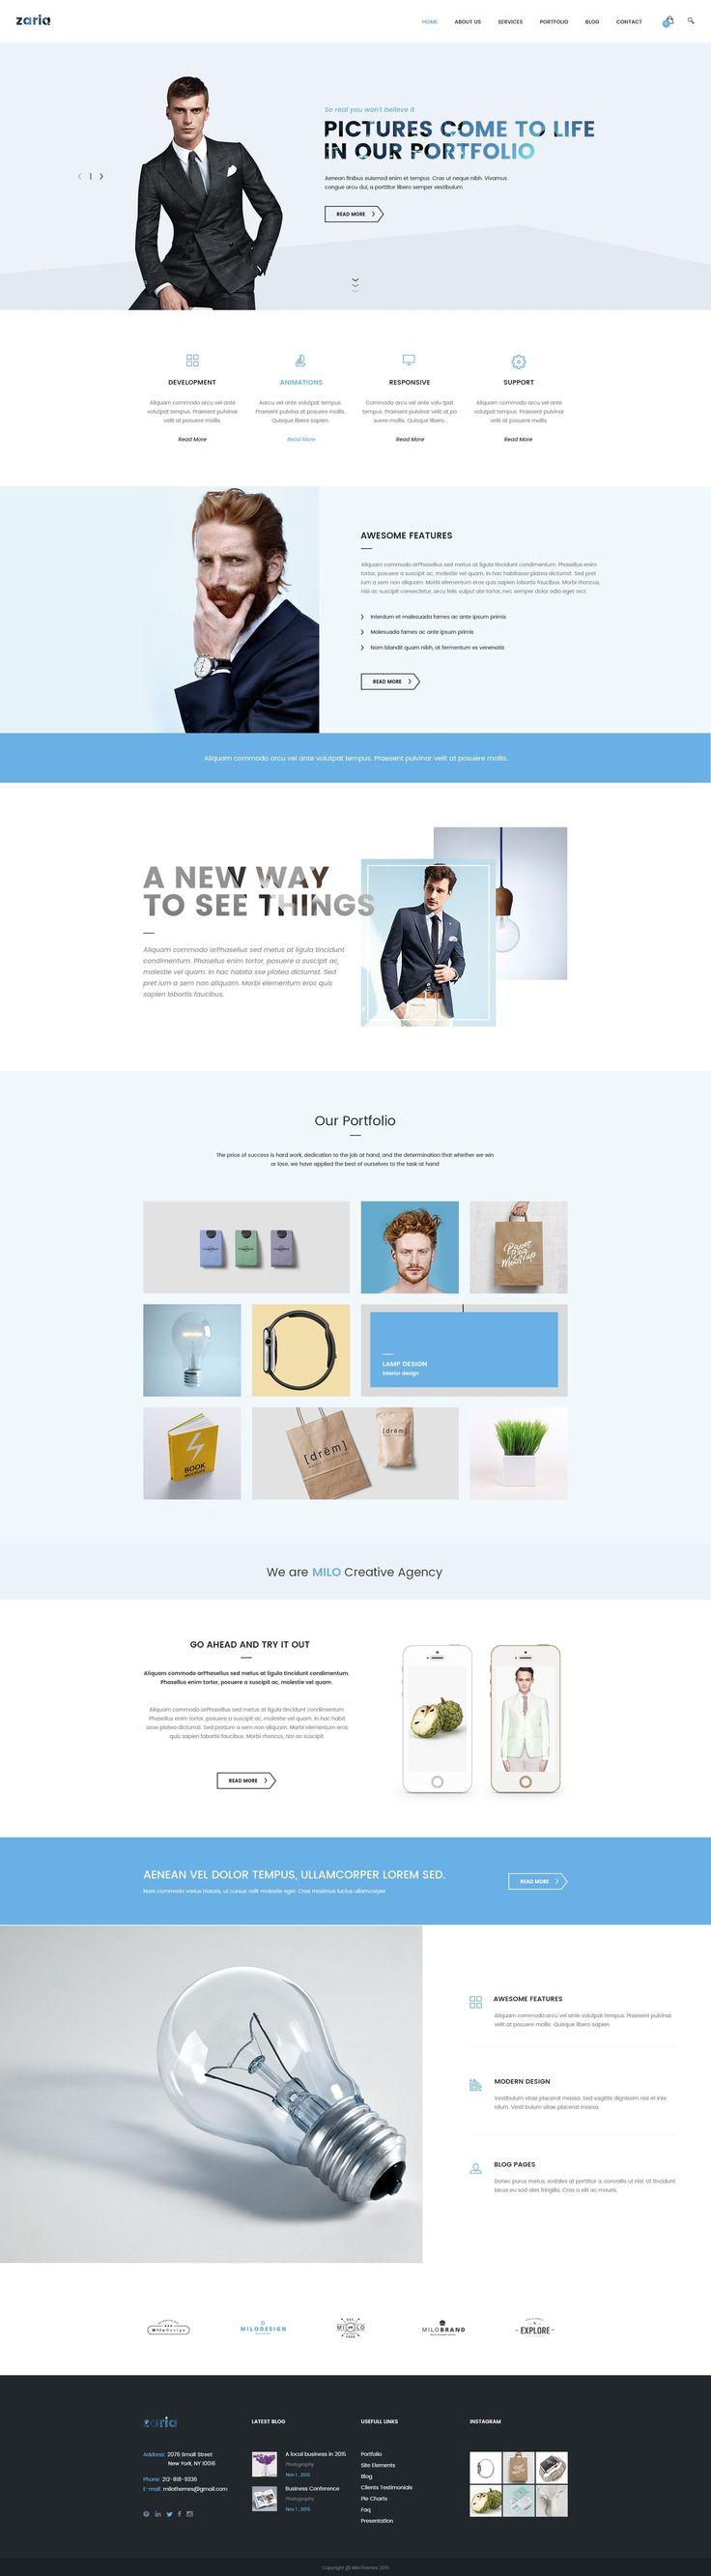 53 best Flat Design Website Templates images on Pinterest   Flat ...